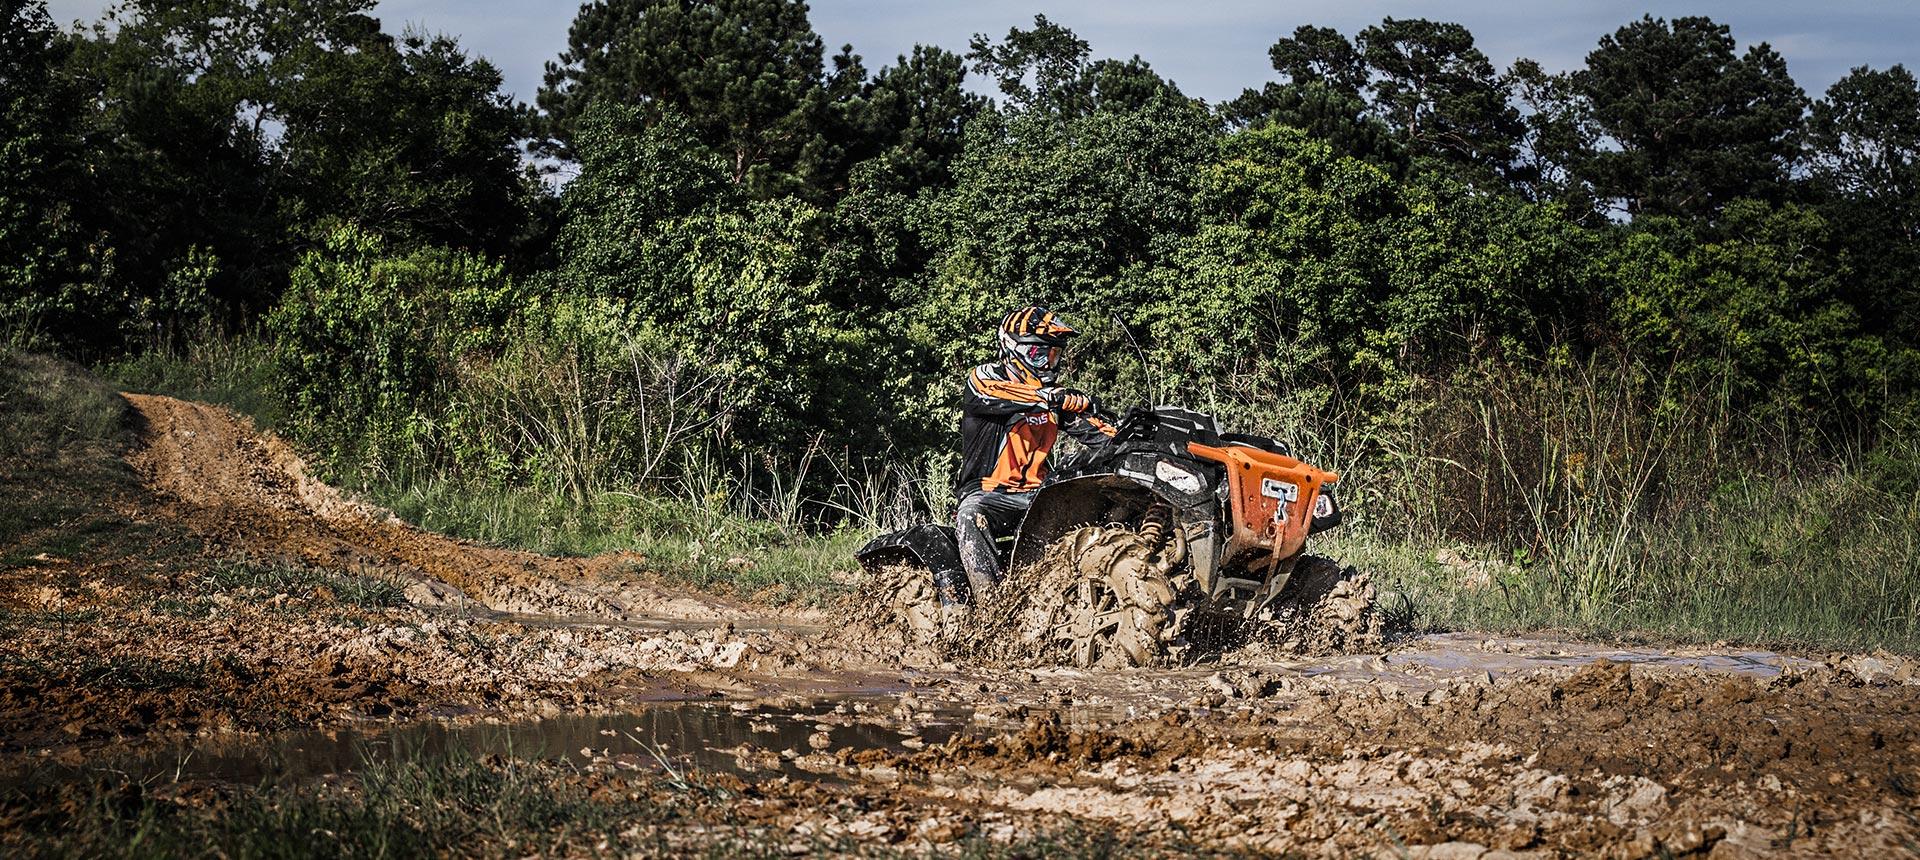 Polaris ATV taking on a muddy crossing.